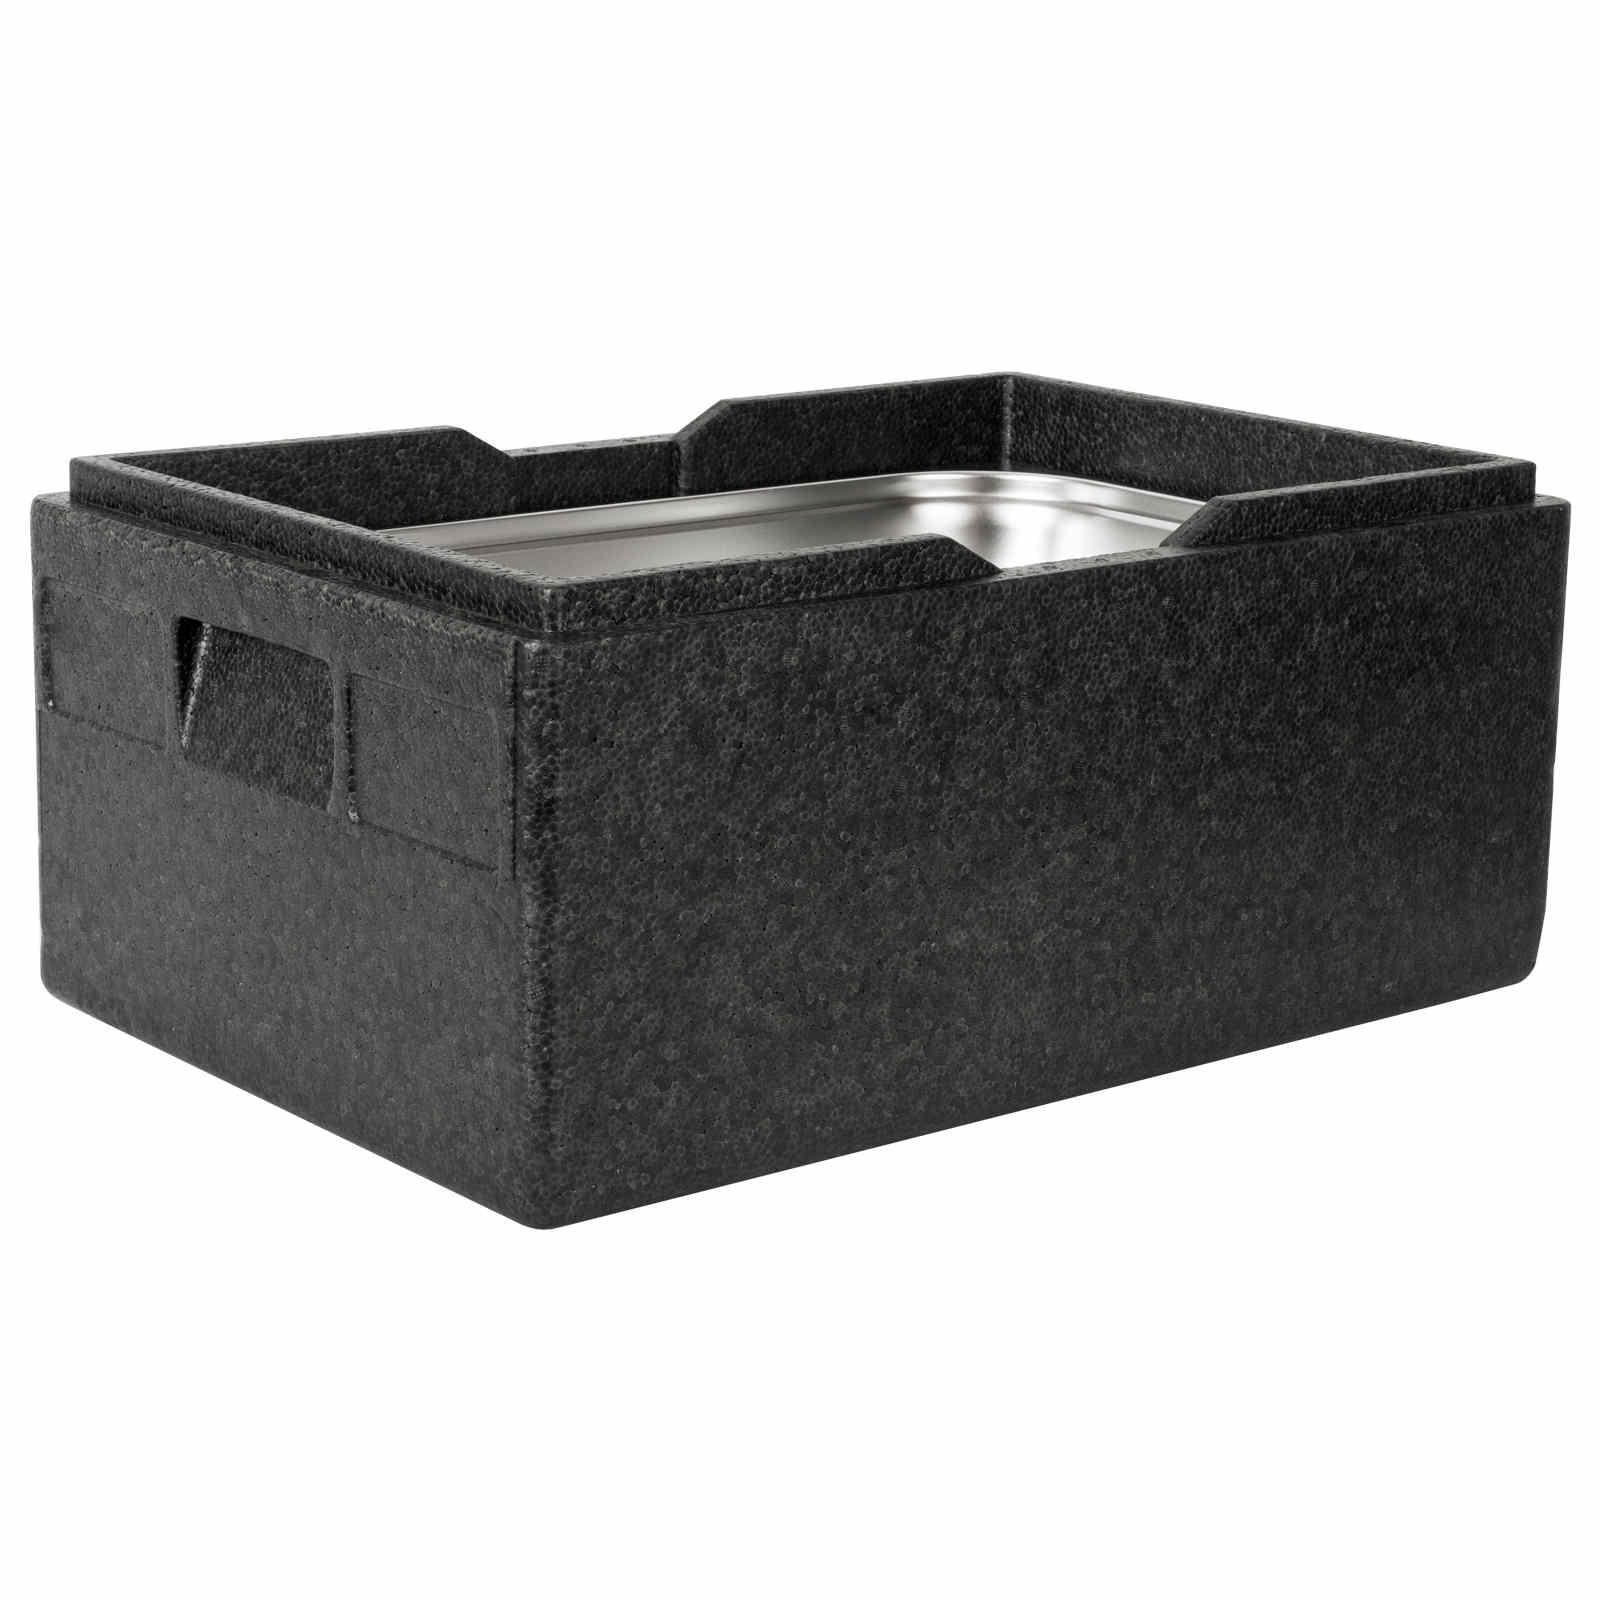 Mehrweg-Thermobox aus Piocelan GN 1/1, 600 x 400 x 283 mm